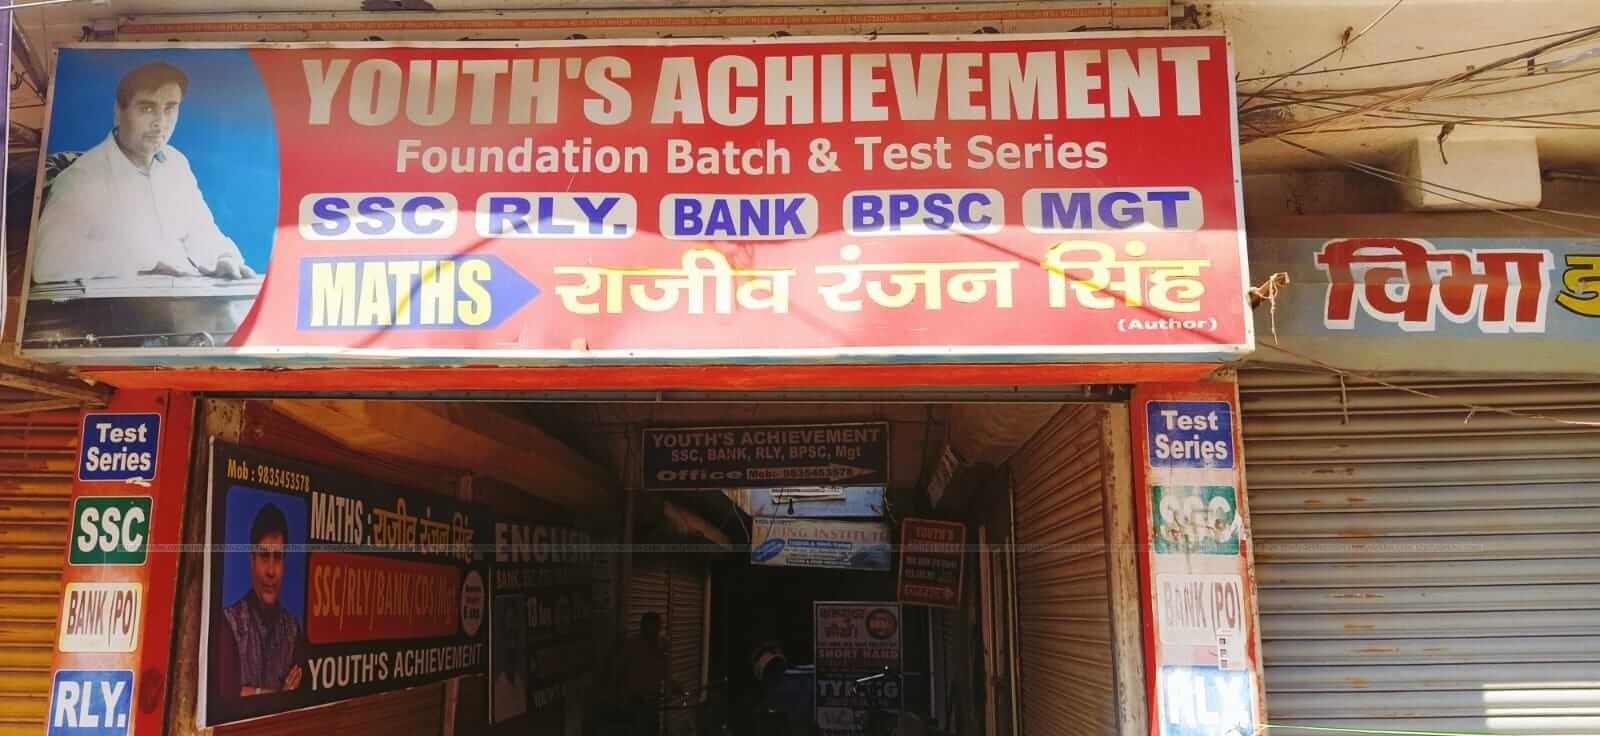 Youths Achievement Logo